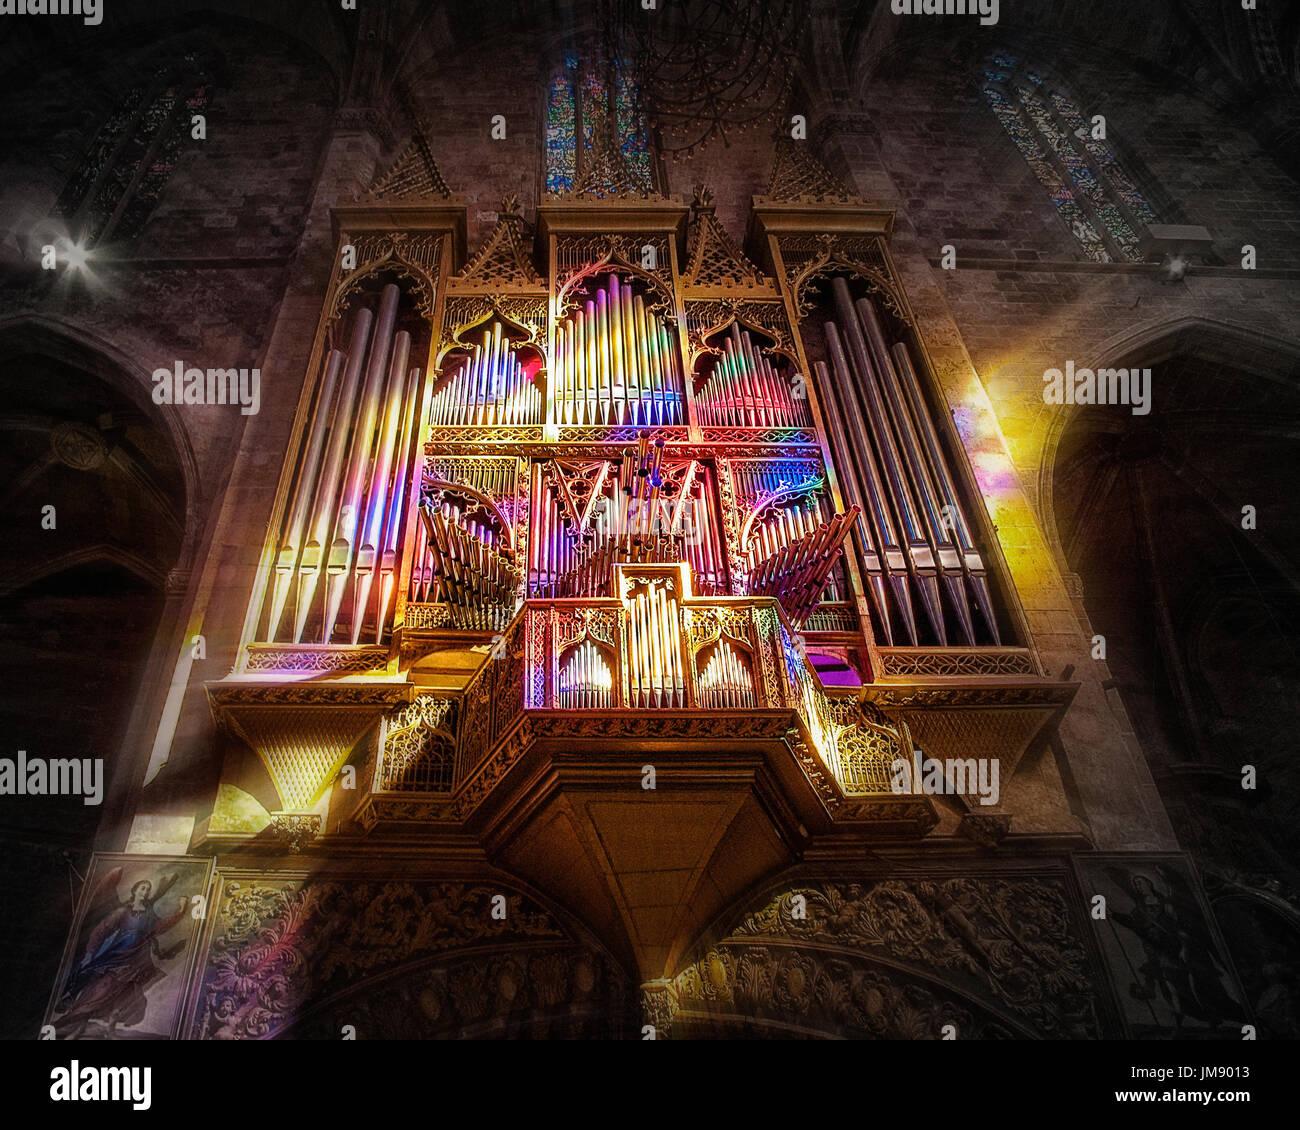 ES - MALLORCA: Blick auf die herrliche Orgel Kathedrale La Seu, Palma Stockbild